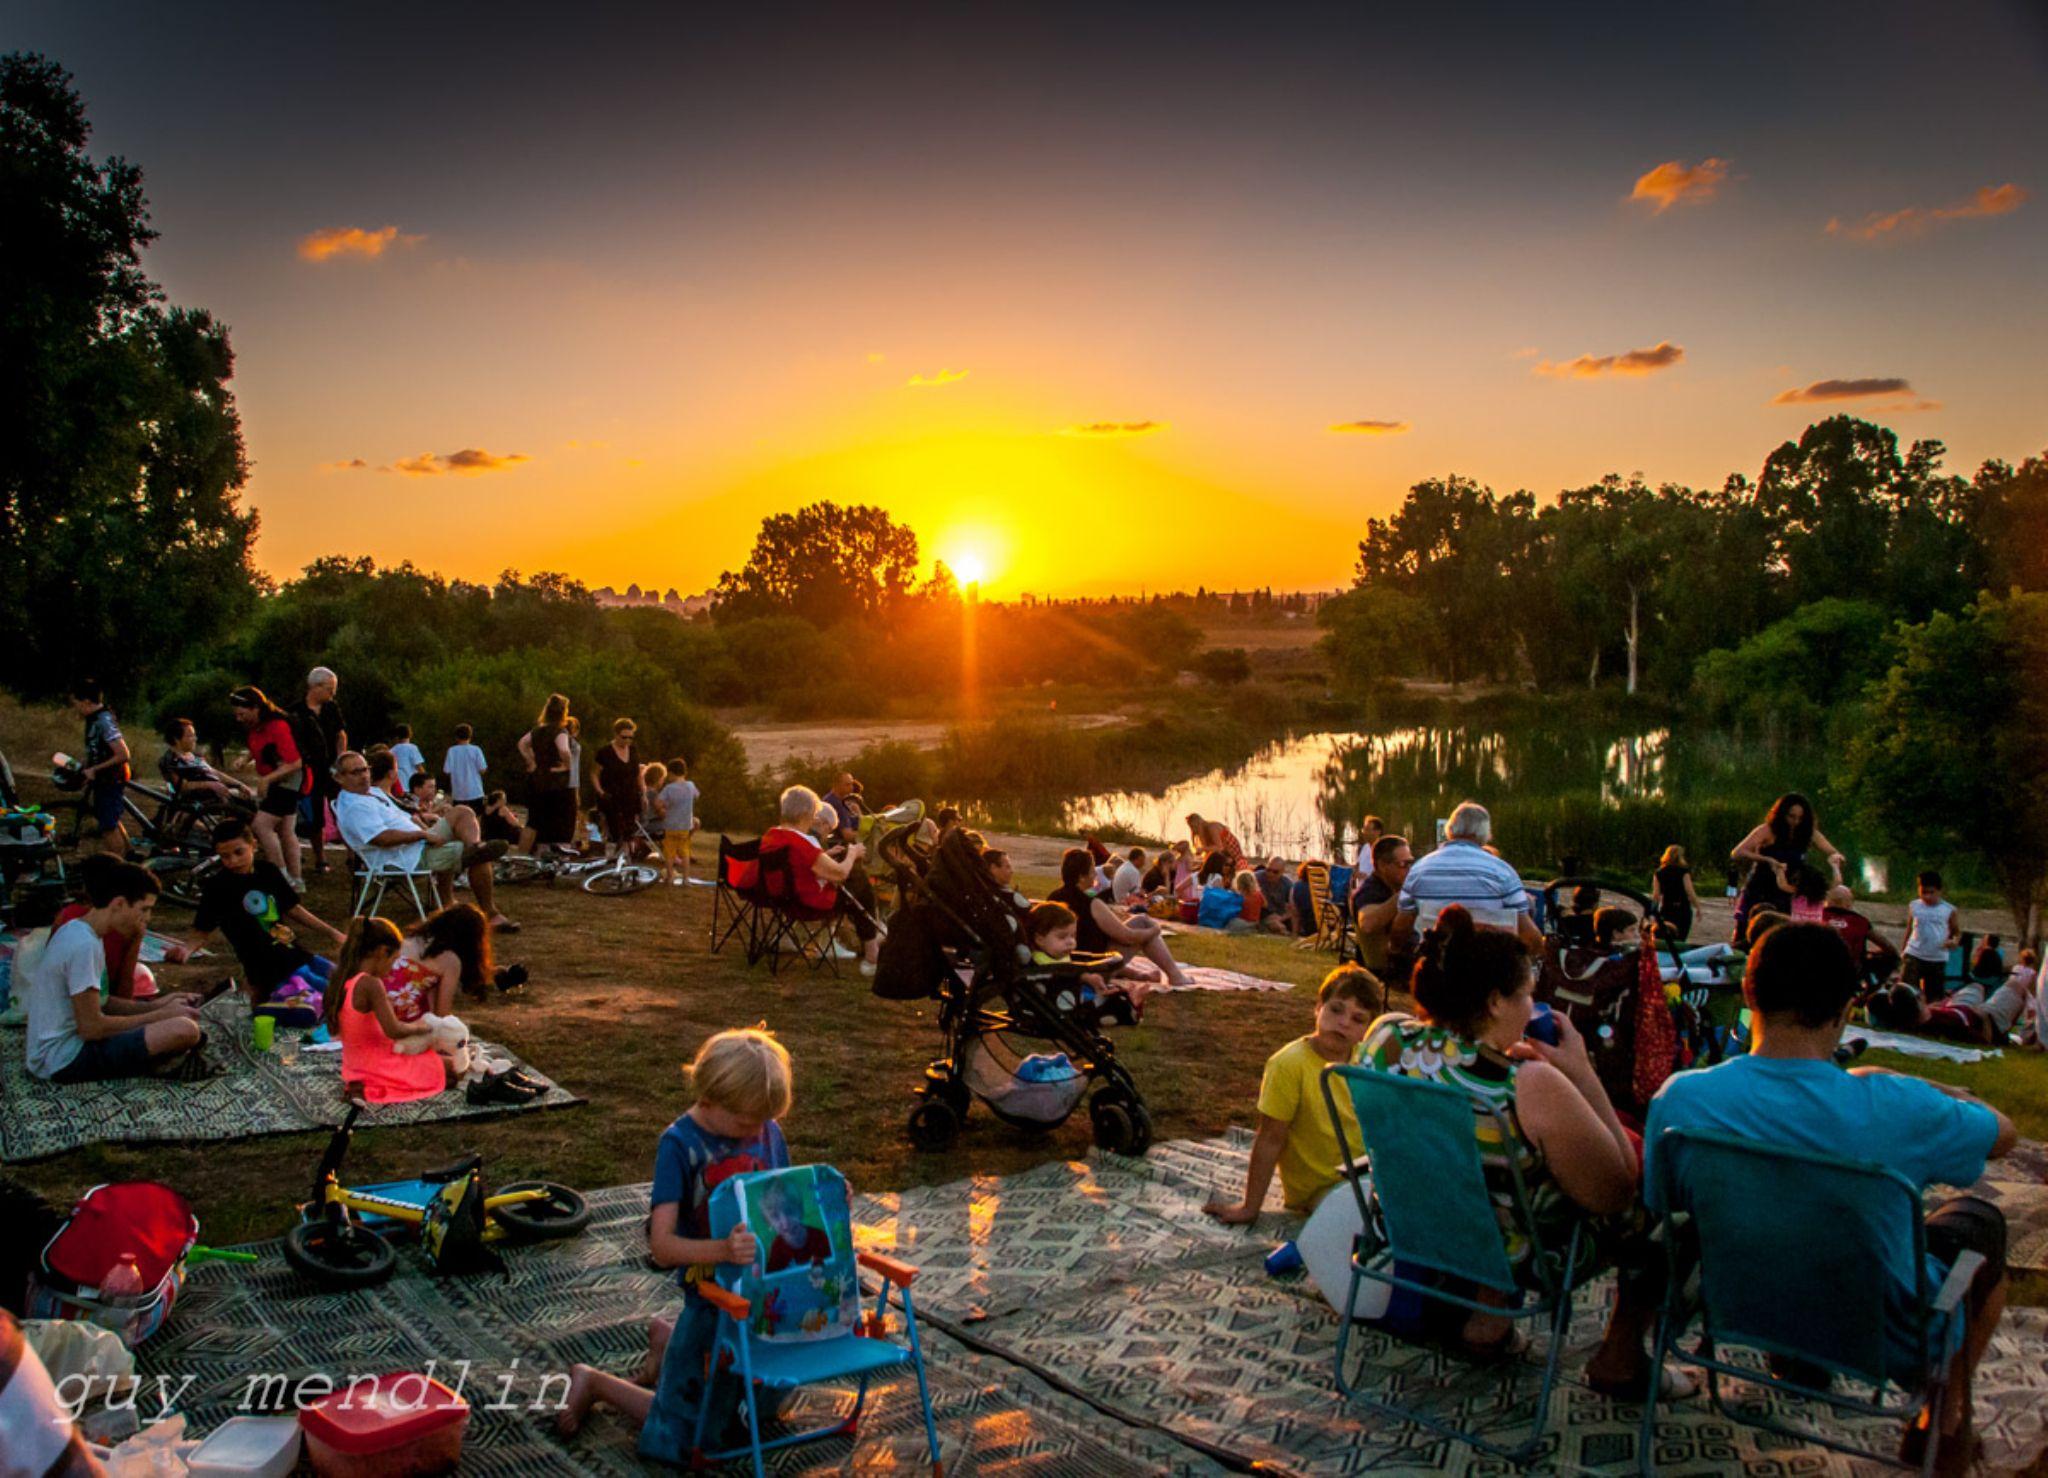 enjoying the park in the sunset by Guy Mendlin